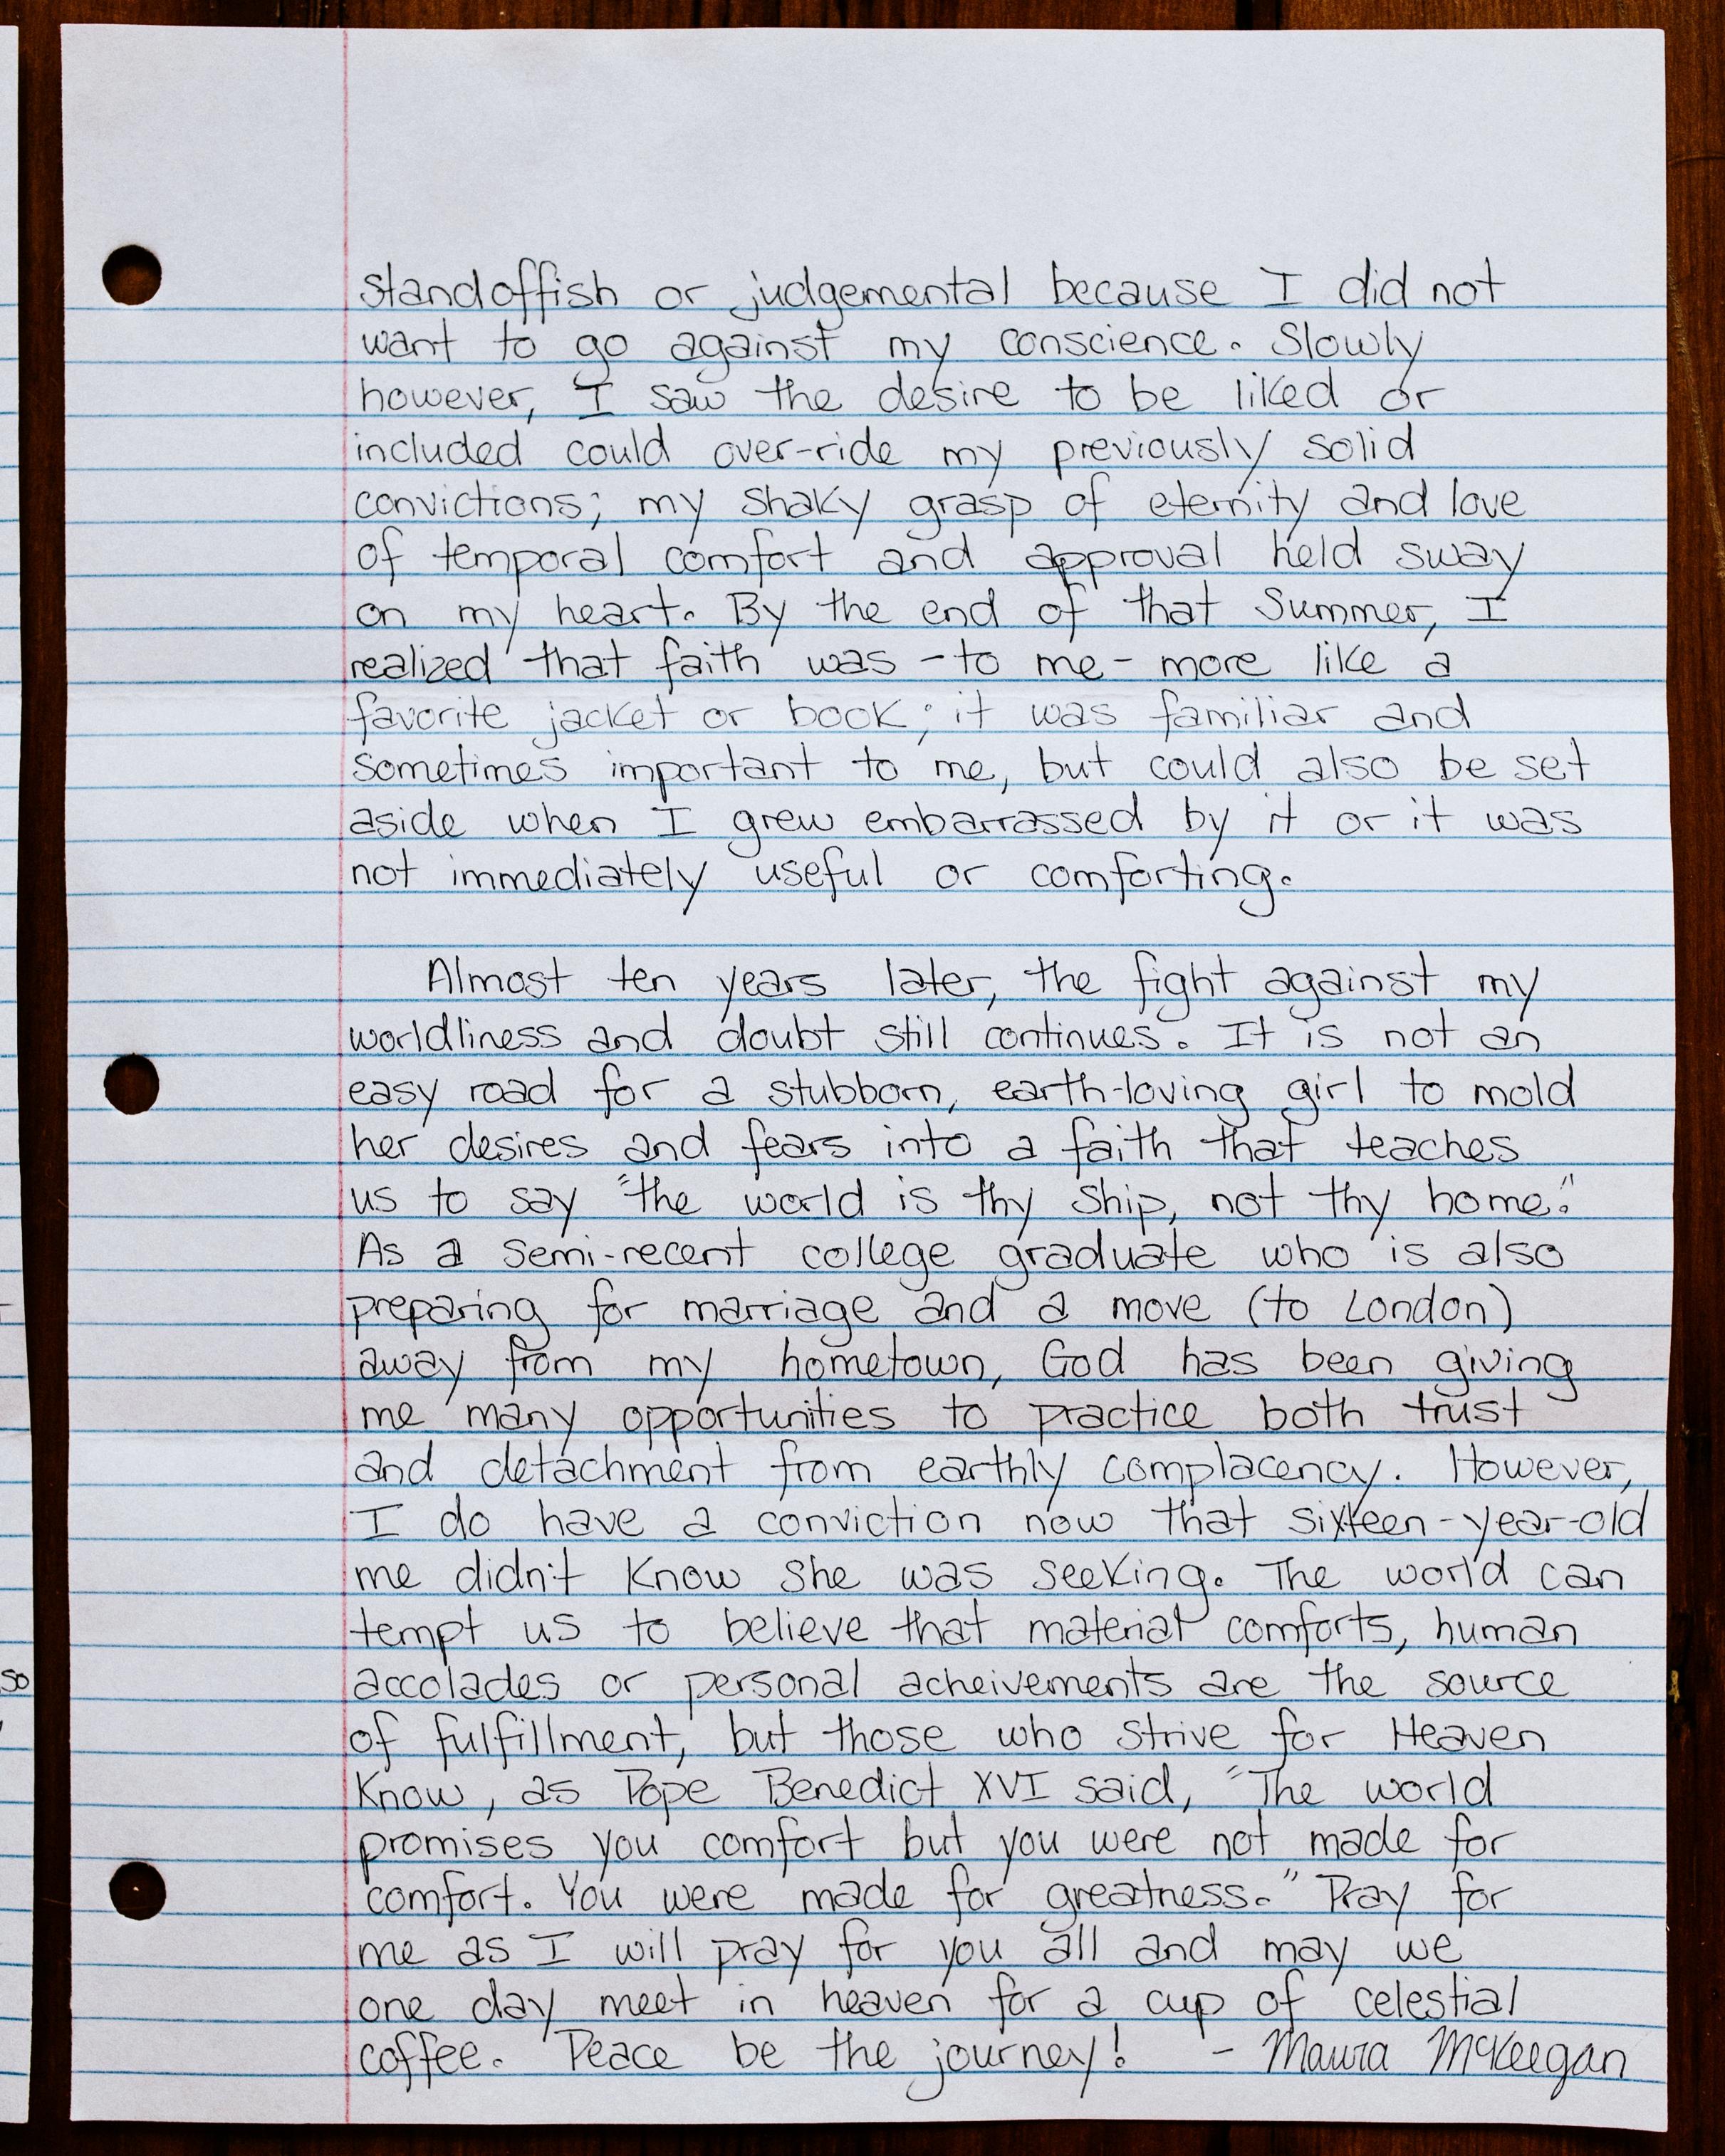 Maura Barnes The Catholic Woman Letter to Women 2